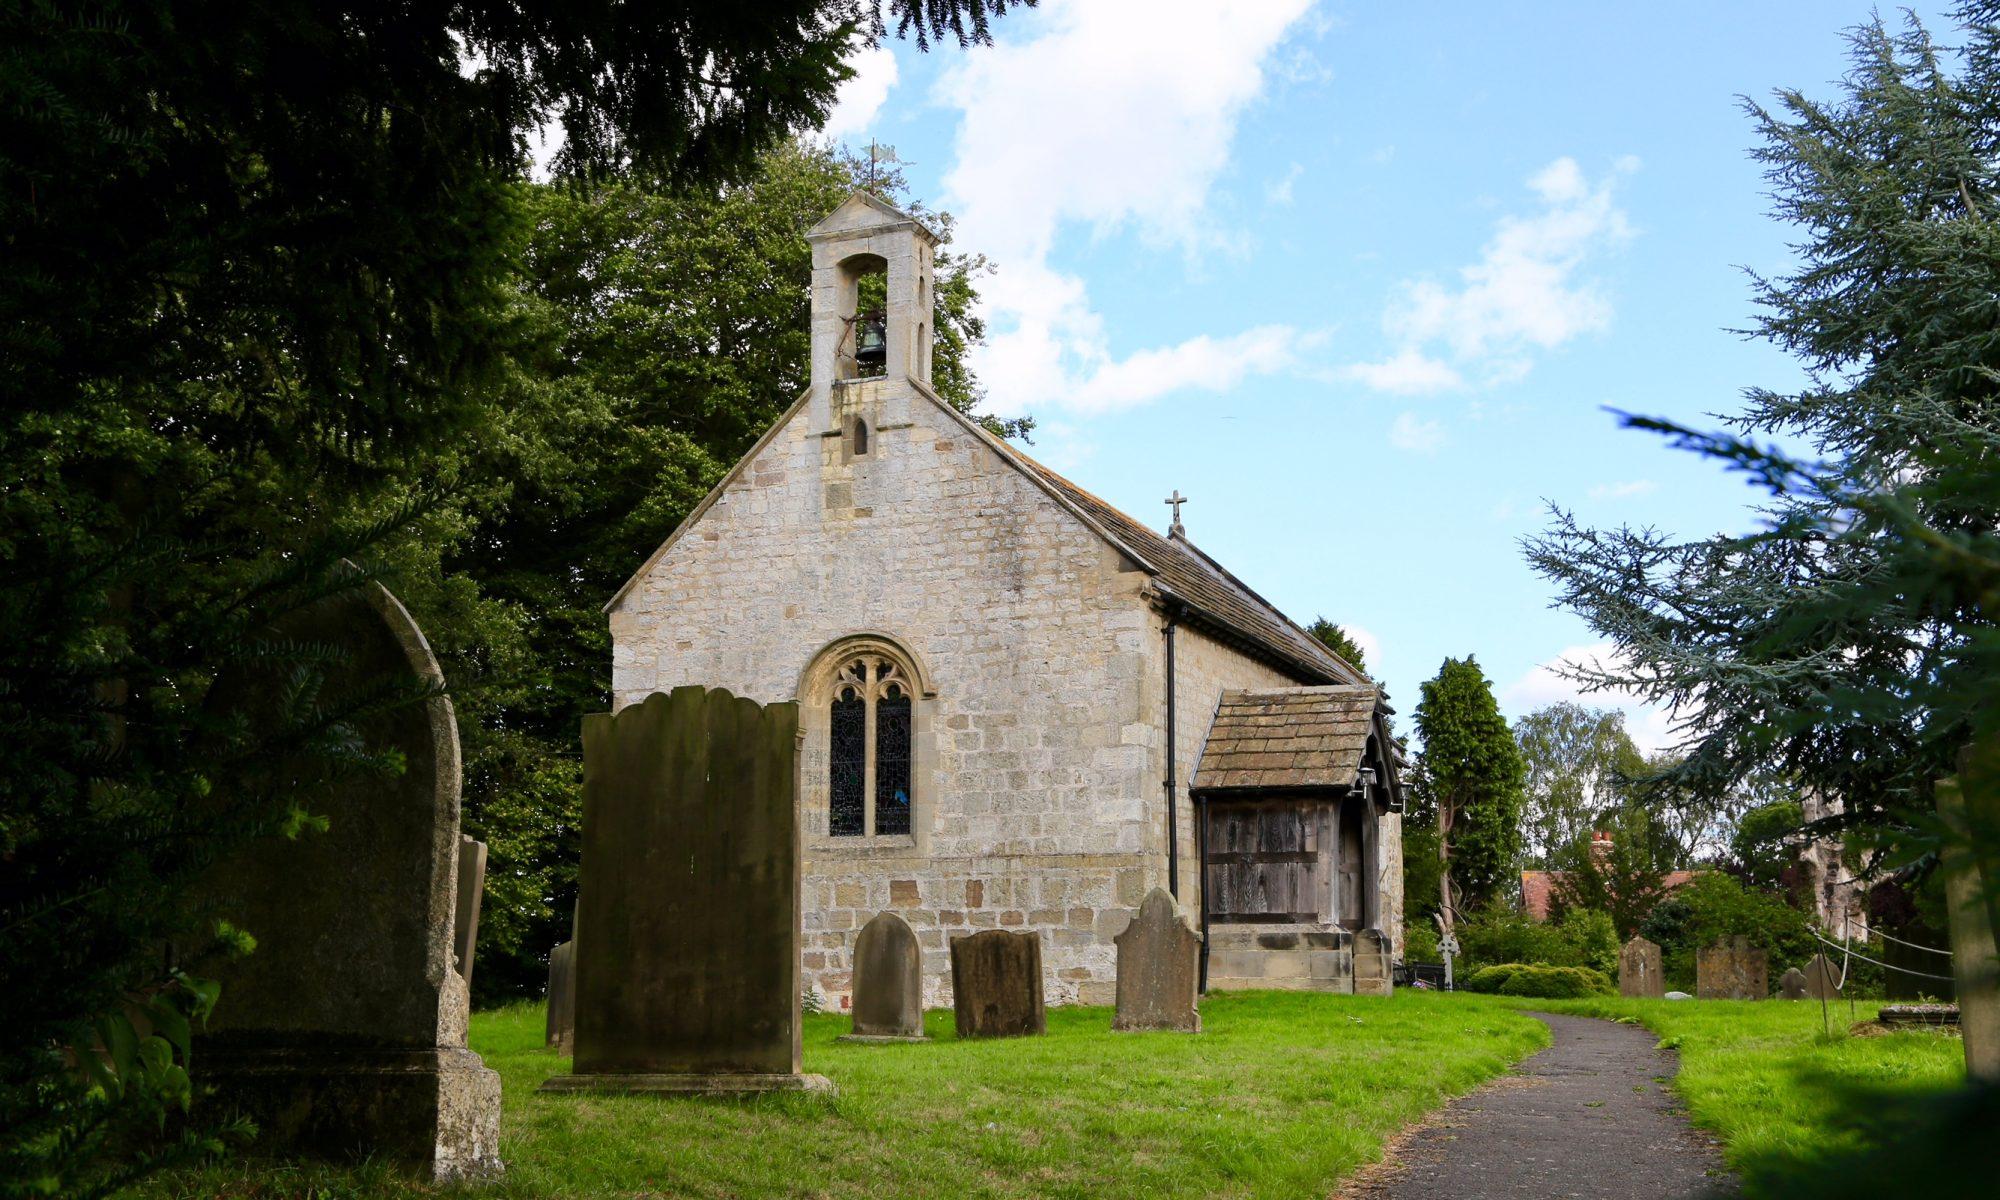 Staveley & Copgrove Parish Council